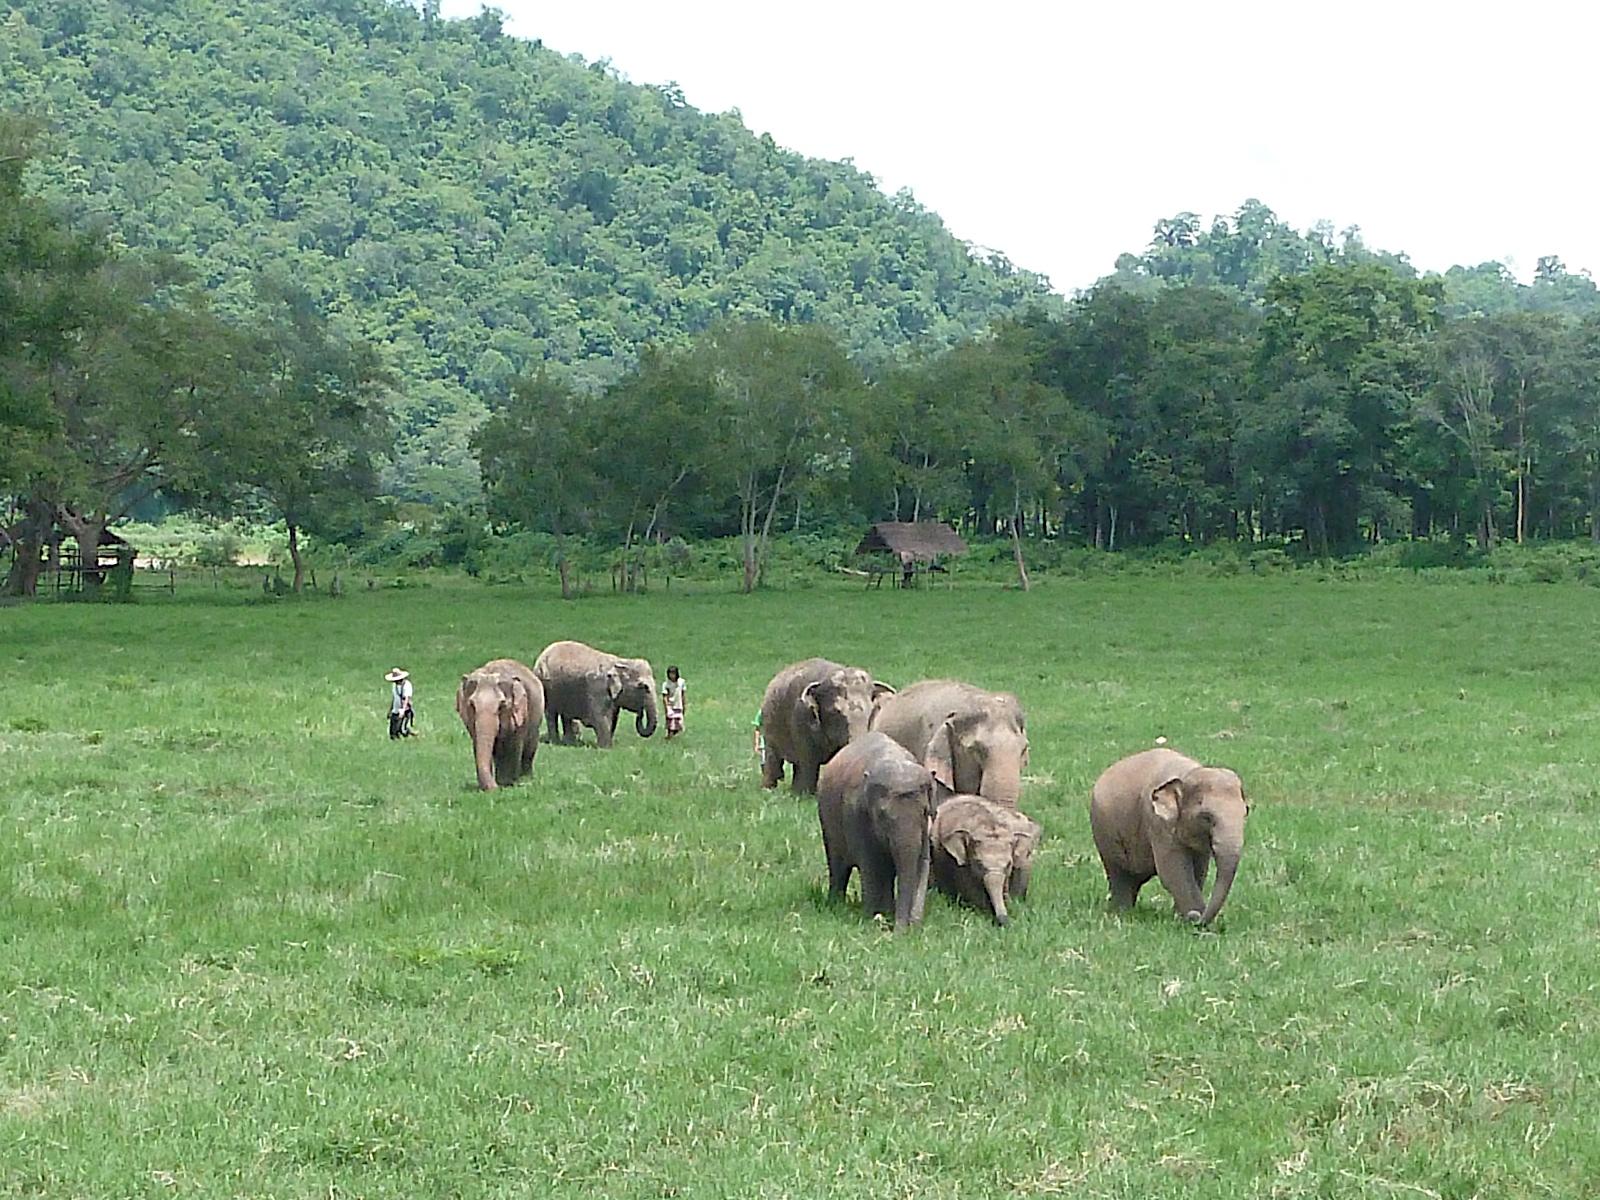 Elephant Nature Park_08_10 1054